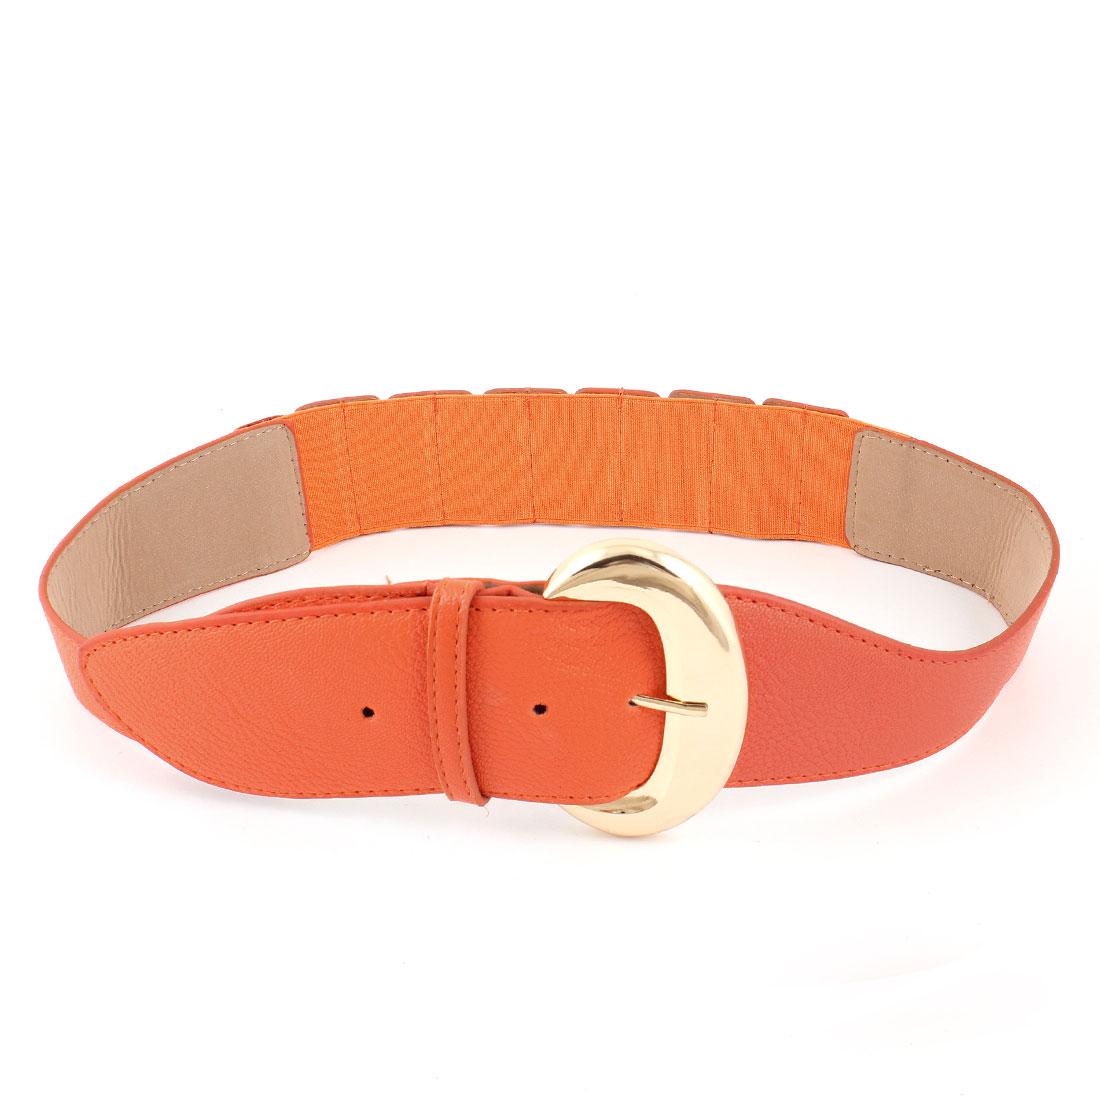 Woman Lady D Shape Single Prong Faux Leather Elastic Dress Waist Belt Orange